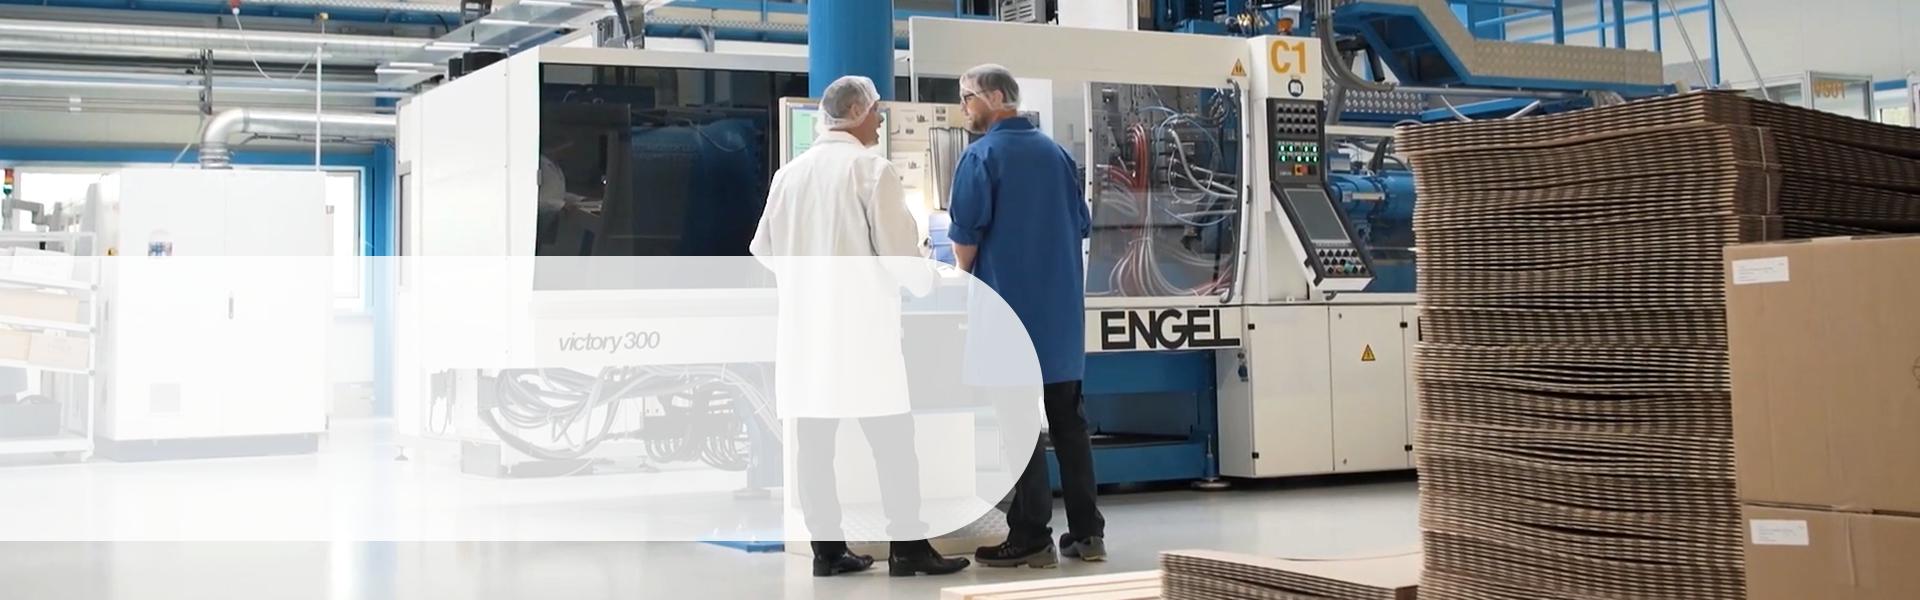 Bürstenmann GmbH: Slider: Imag...